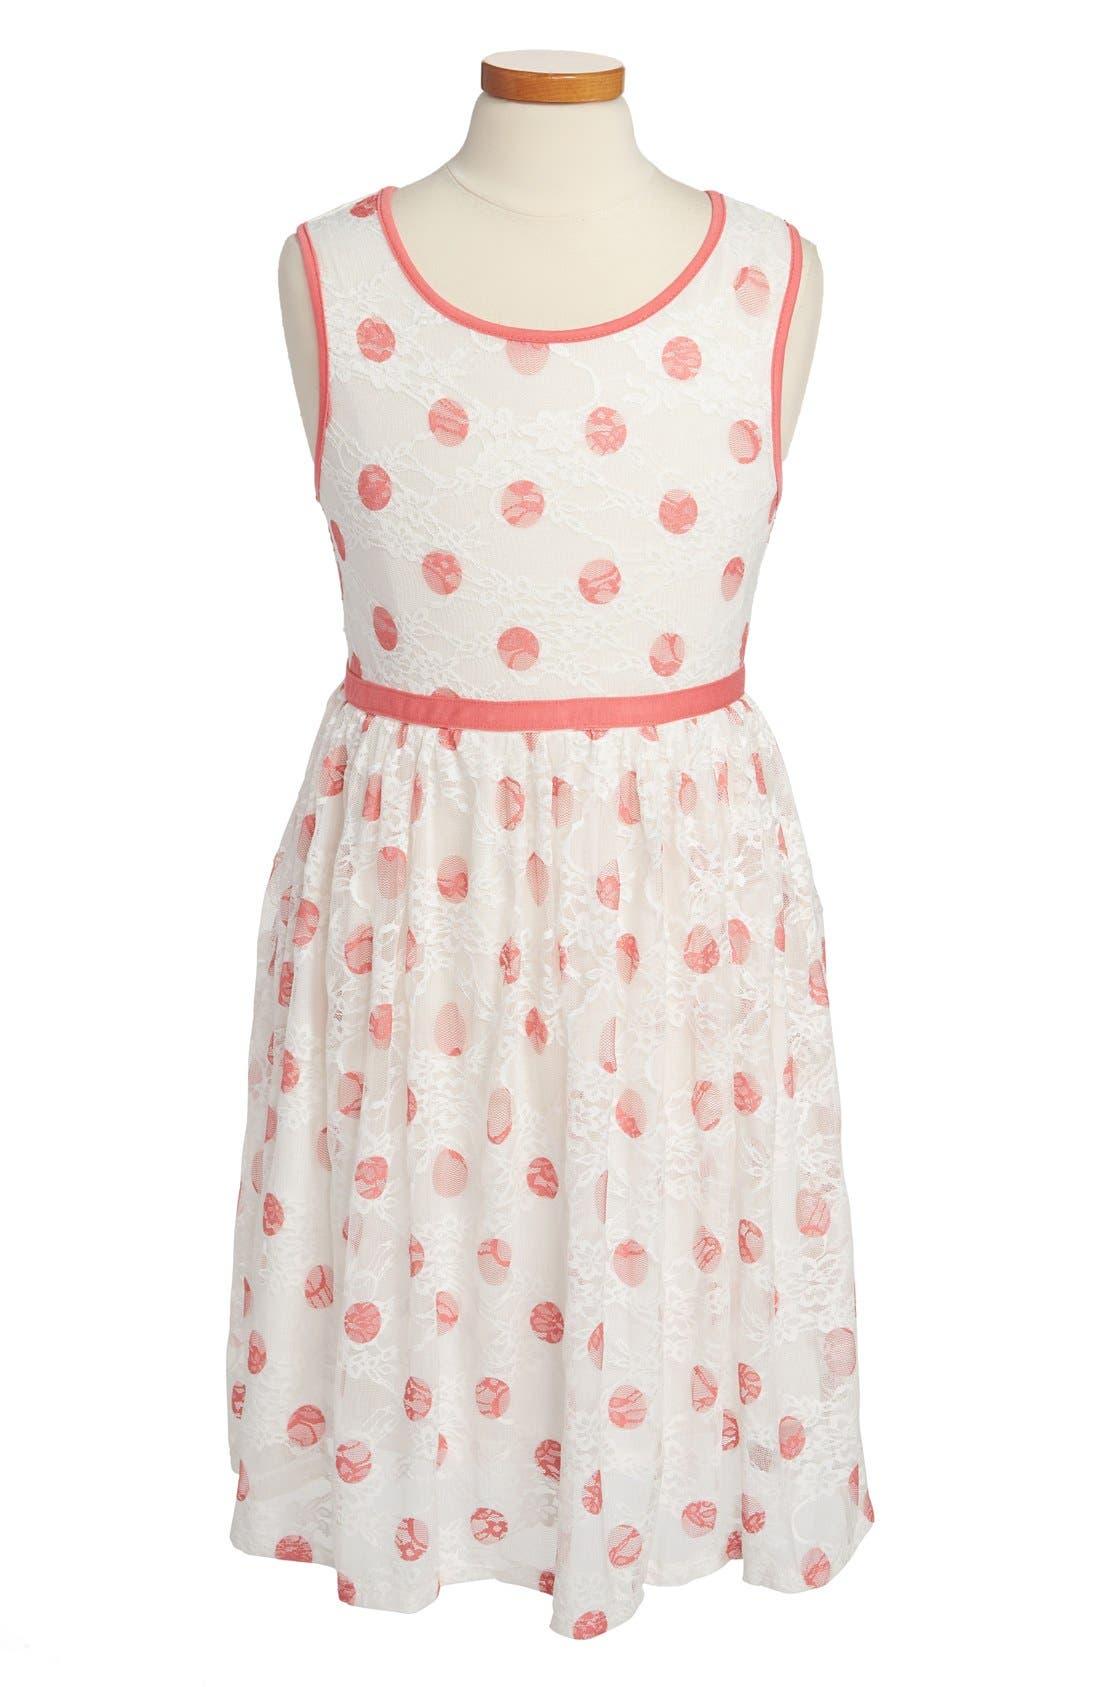 Alternate Image 1 Selected - Zunie Dot Print Lace Dress (Big Girls)